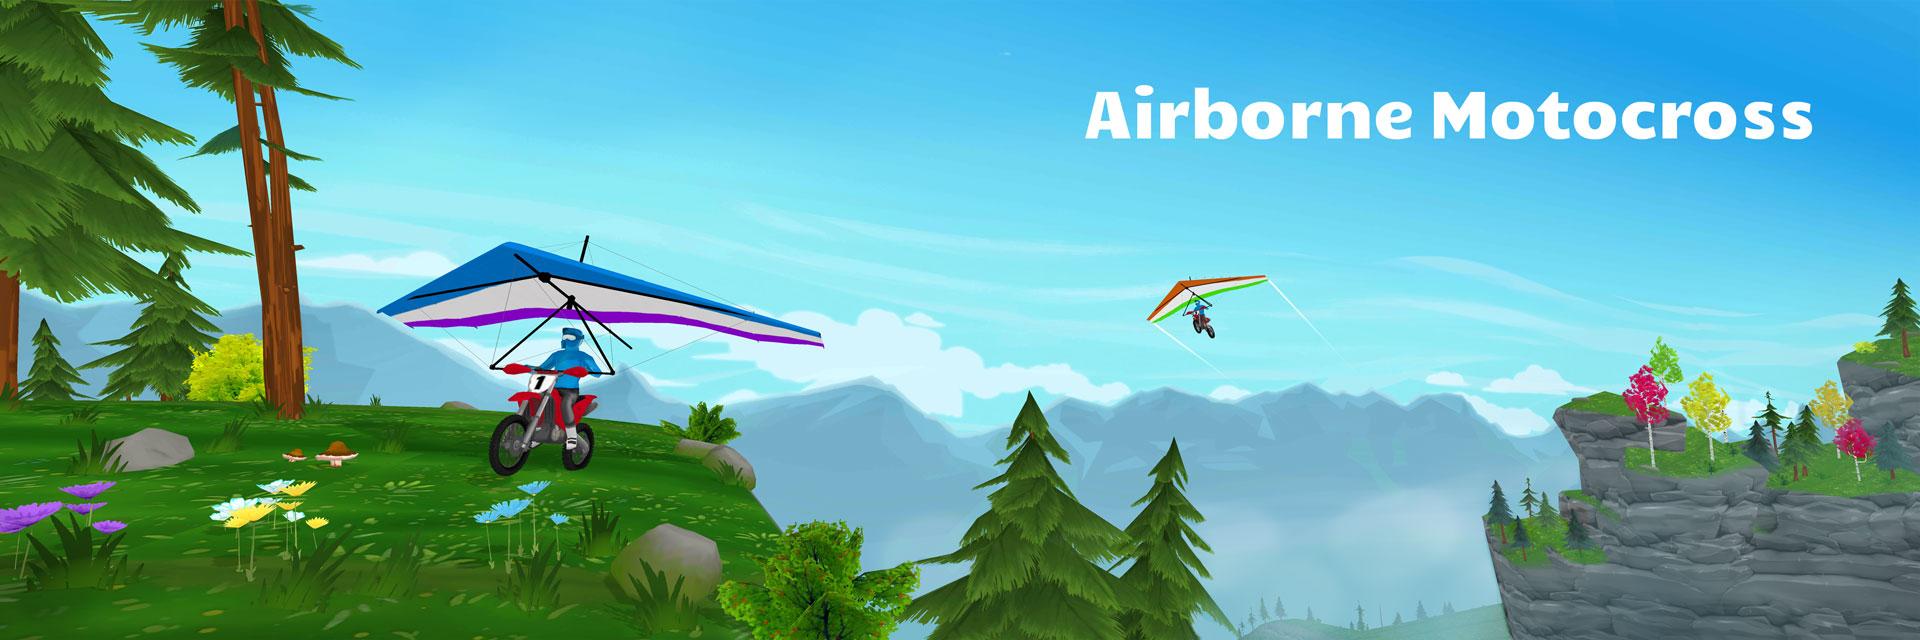 Airborne Motocross (Demo)